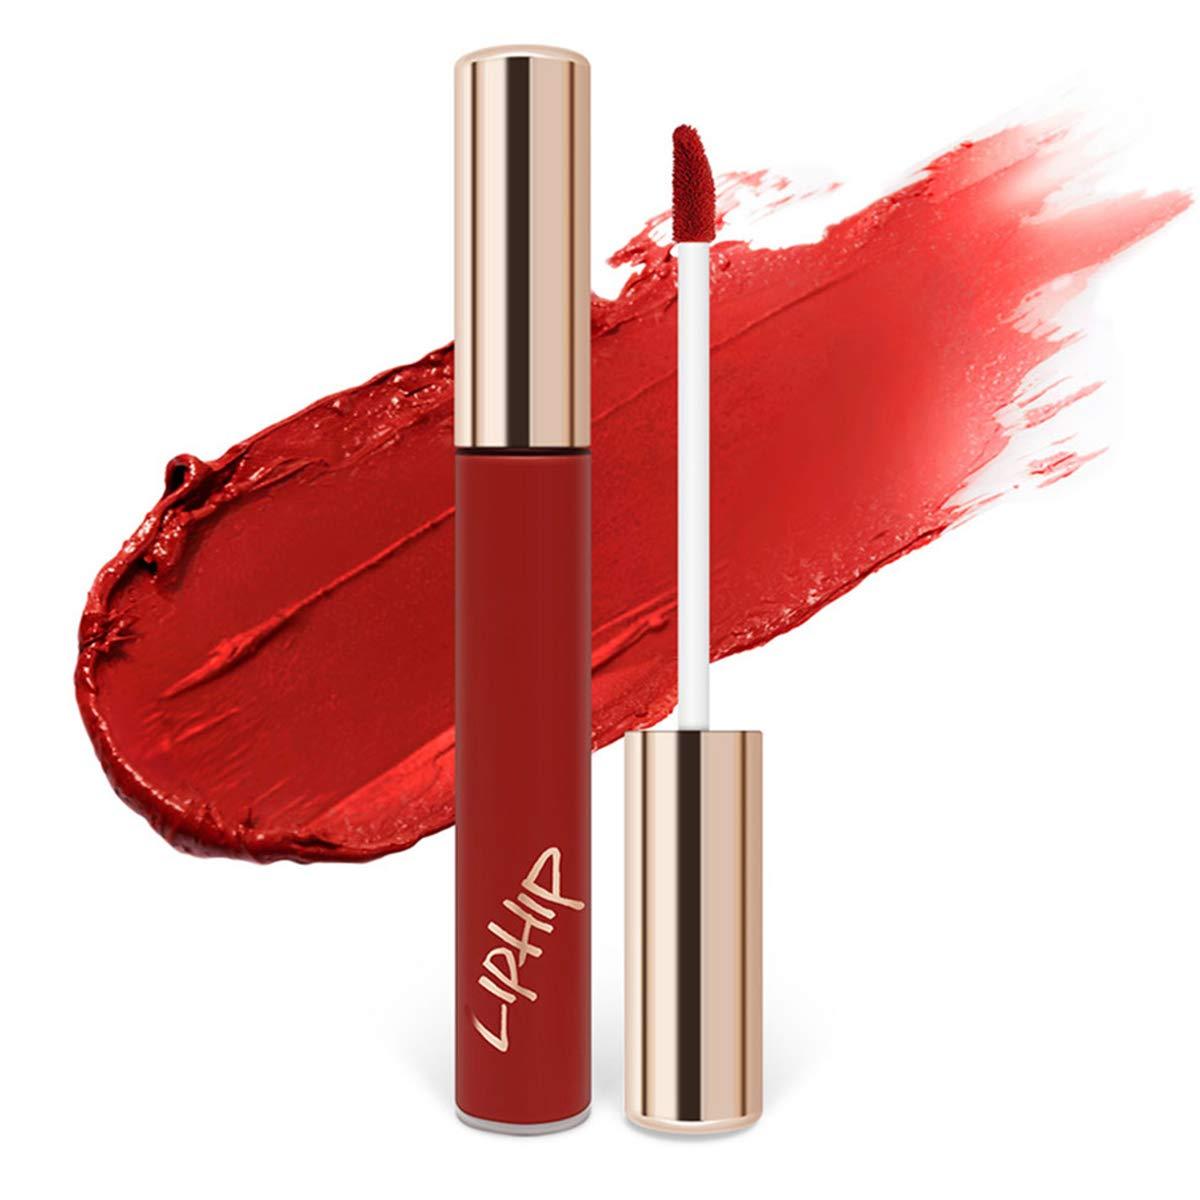 LIPHIP Lip Matte Tint, Long Lasting Lip Stain, 6ml, DEEP KISS(9colors)